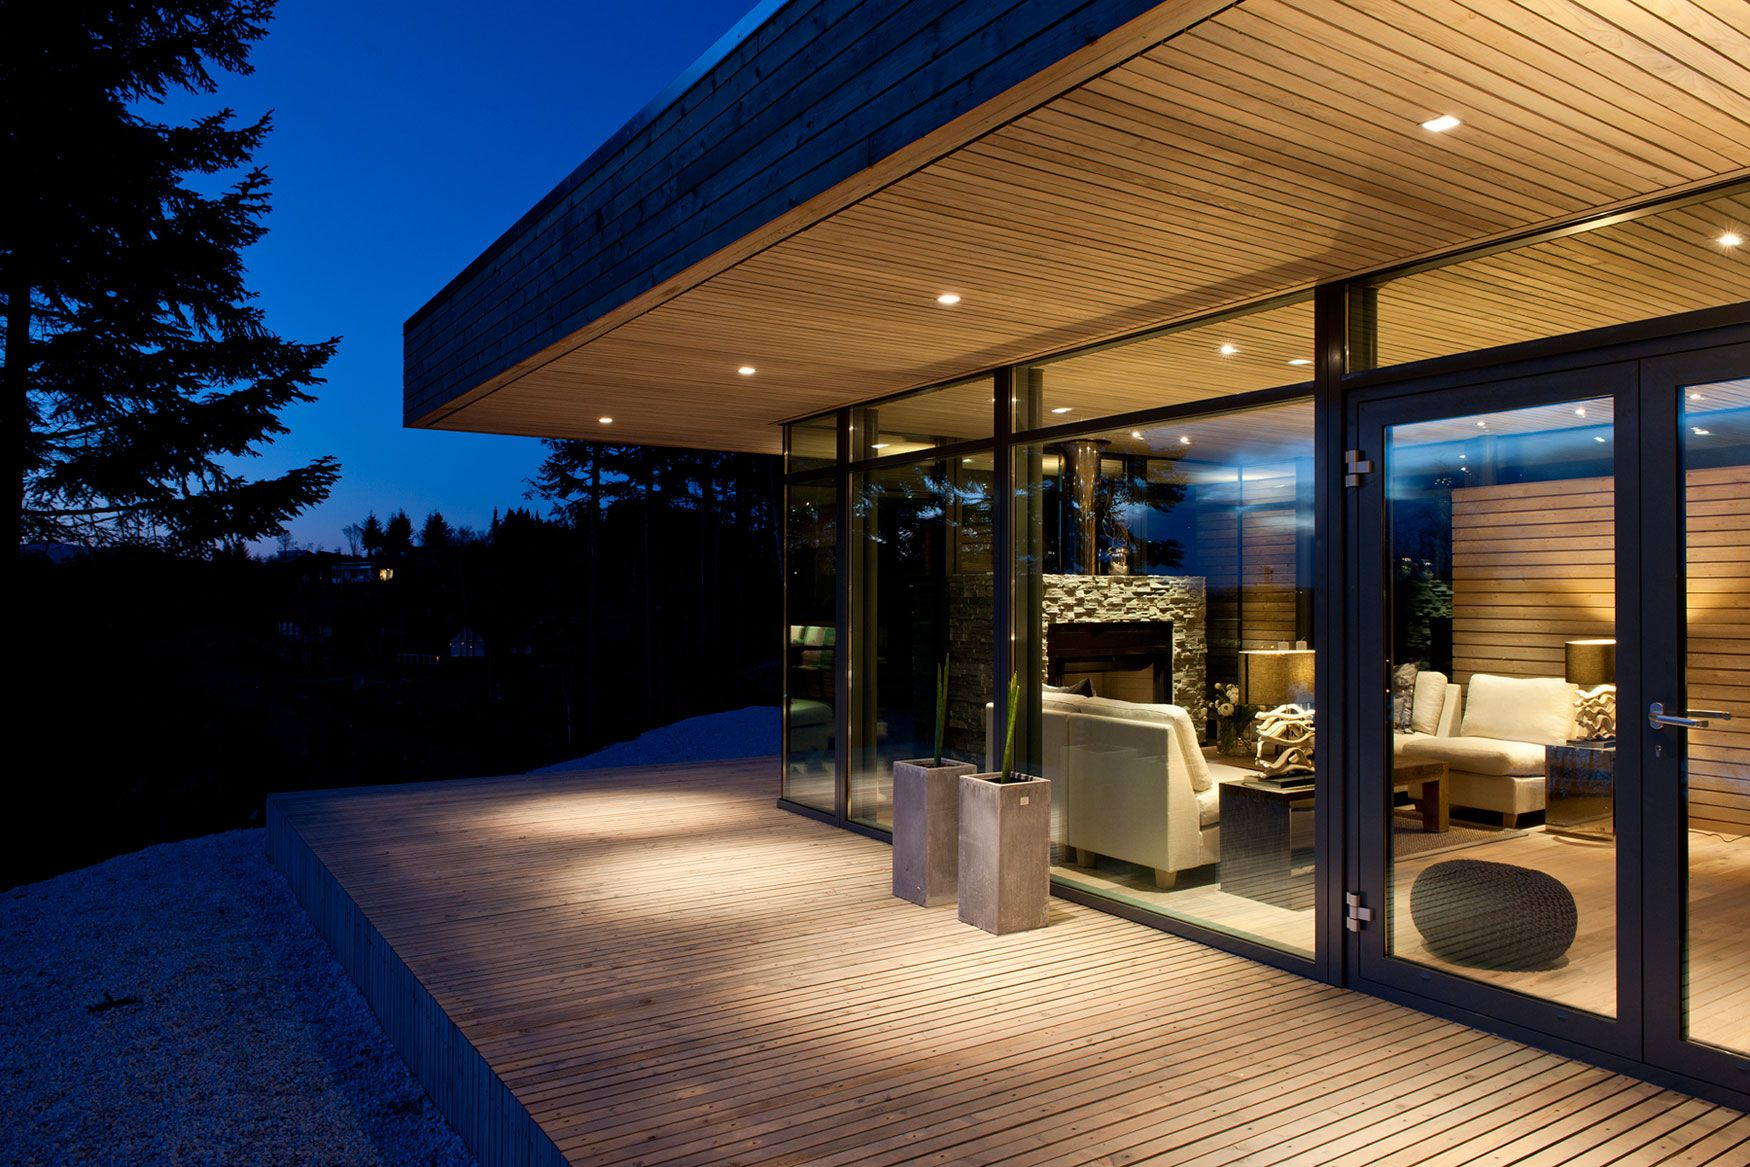 Modern Cabin GJ 9 by Gudmundur Jonsson Architect Varandas e